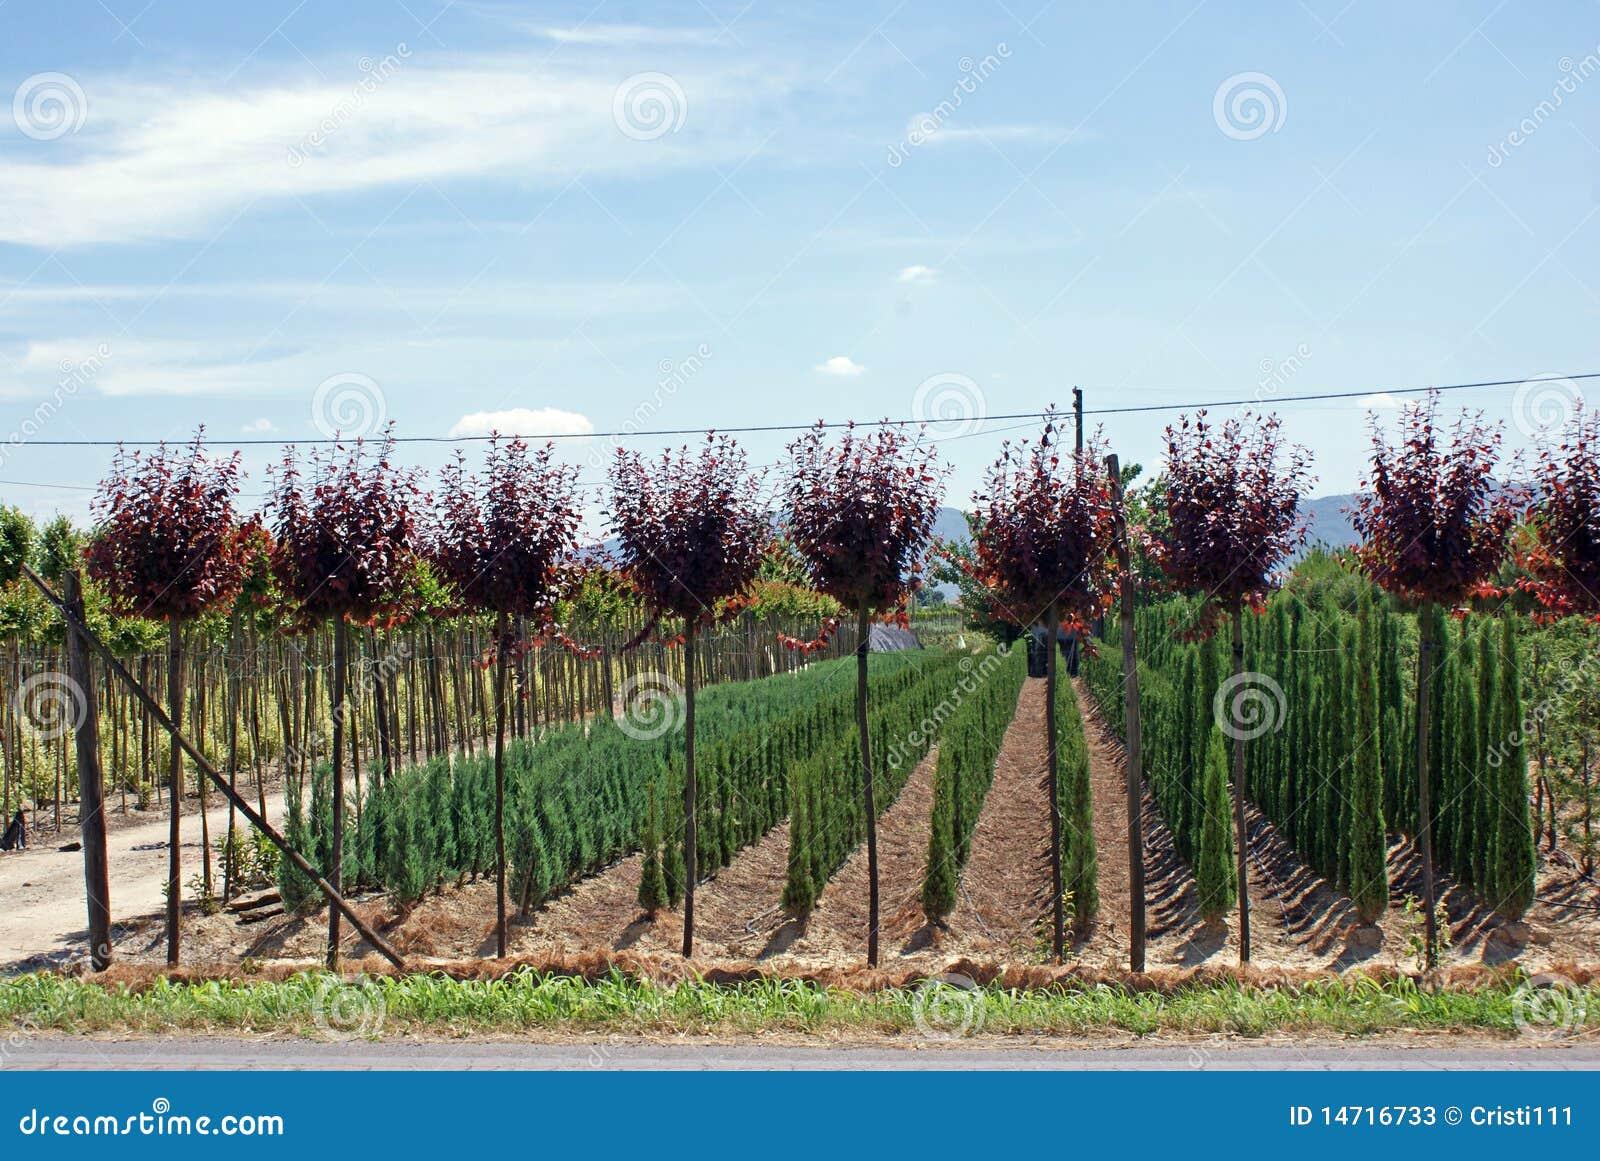 Plantation d 39 arbres photos stock image 14716733 - Plantation d arbres synonyme ...